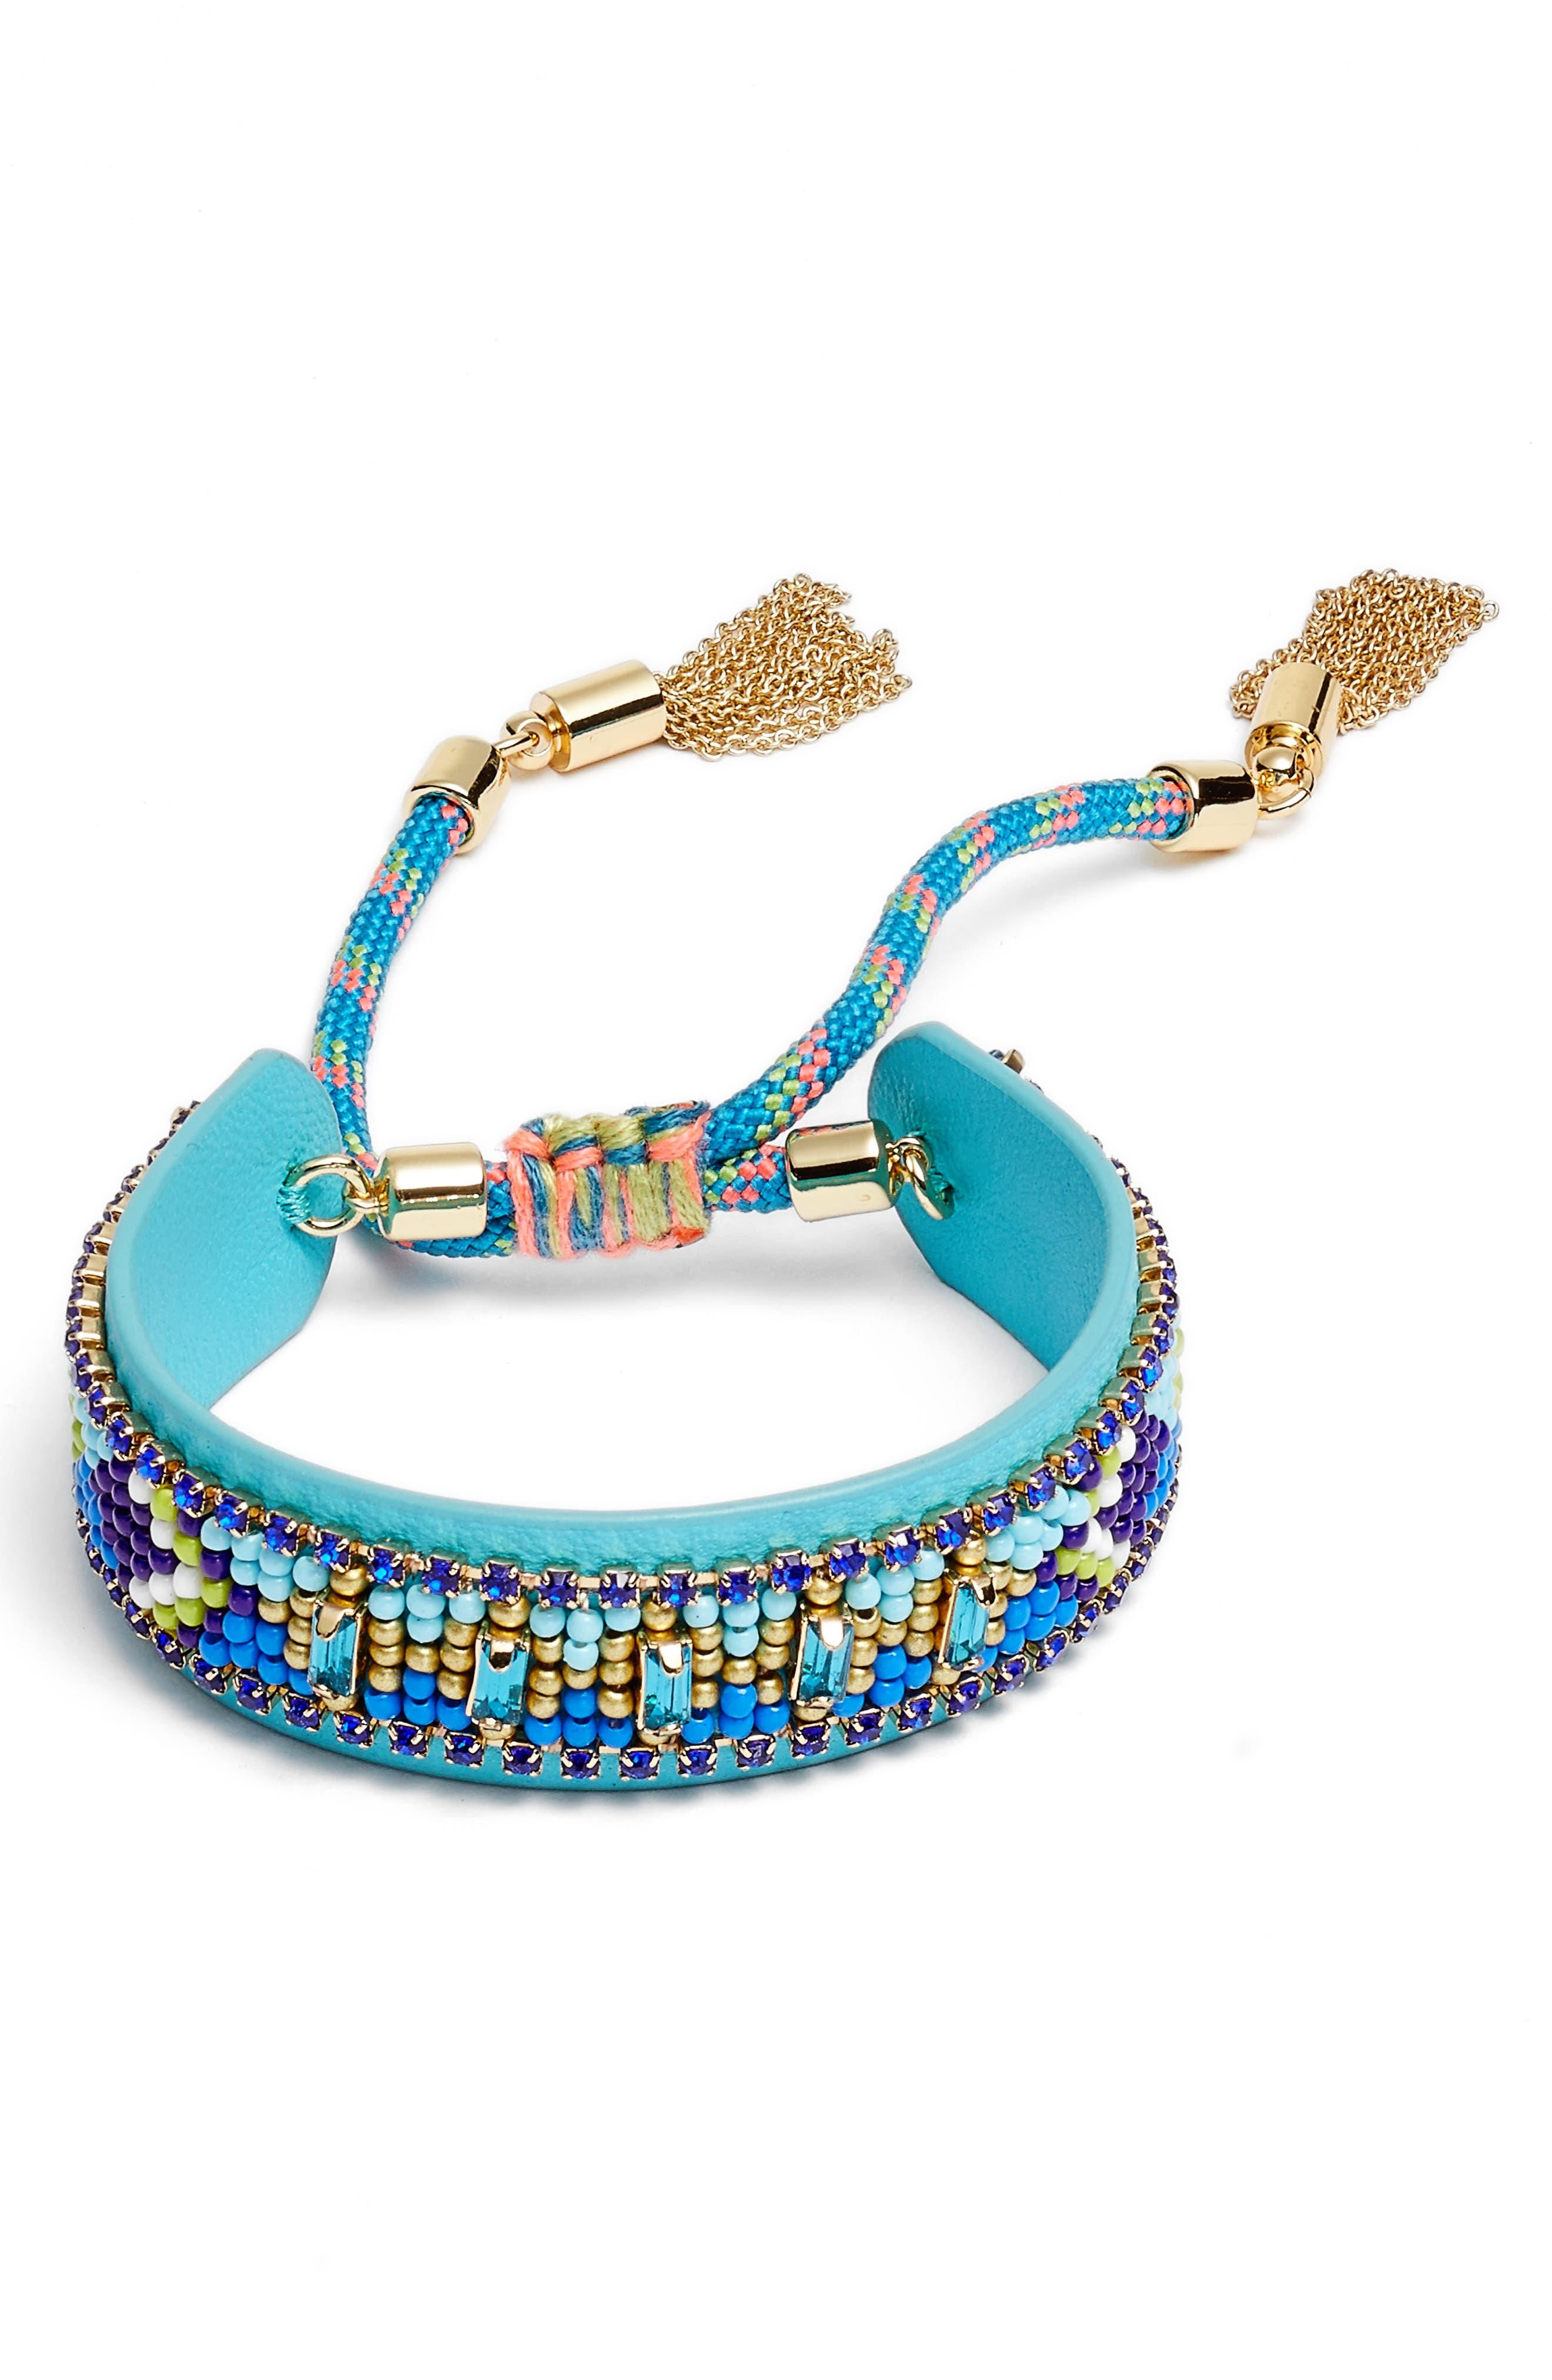 Zigzag Beaded Leather Friendship Bracelet,                         Main,                         color, Turquoise Multi